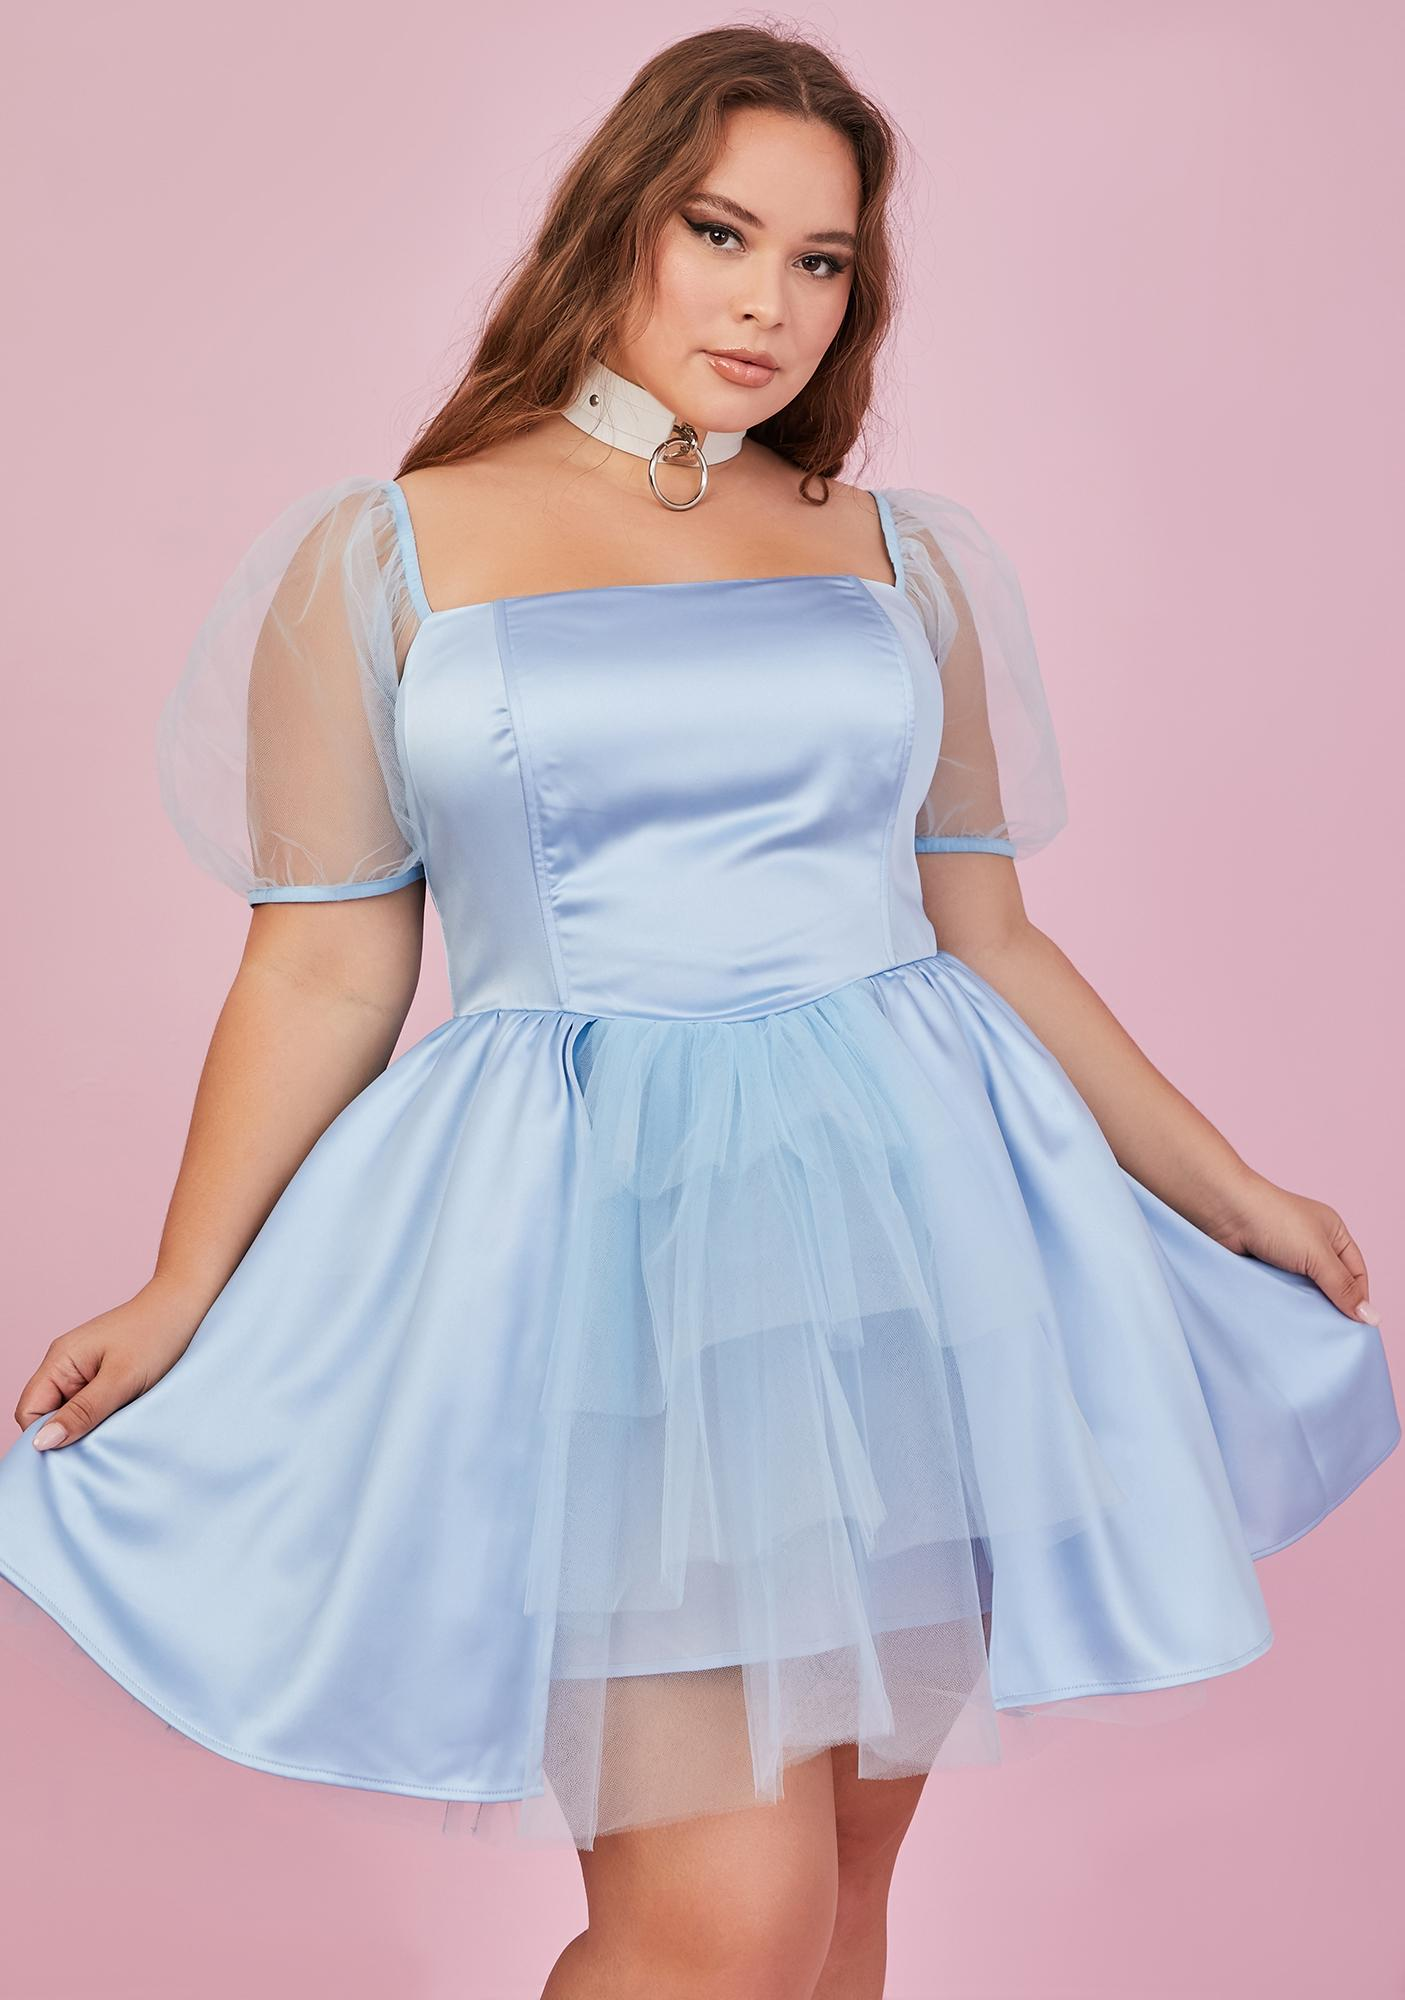 Sugar Thrillz I've Got You Babe Satin Mini Dress